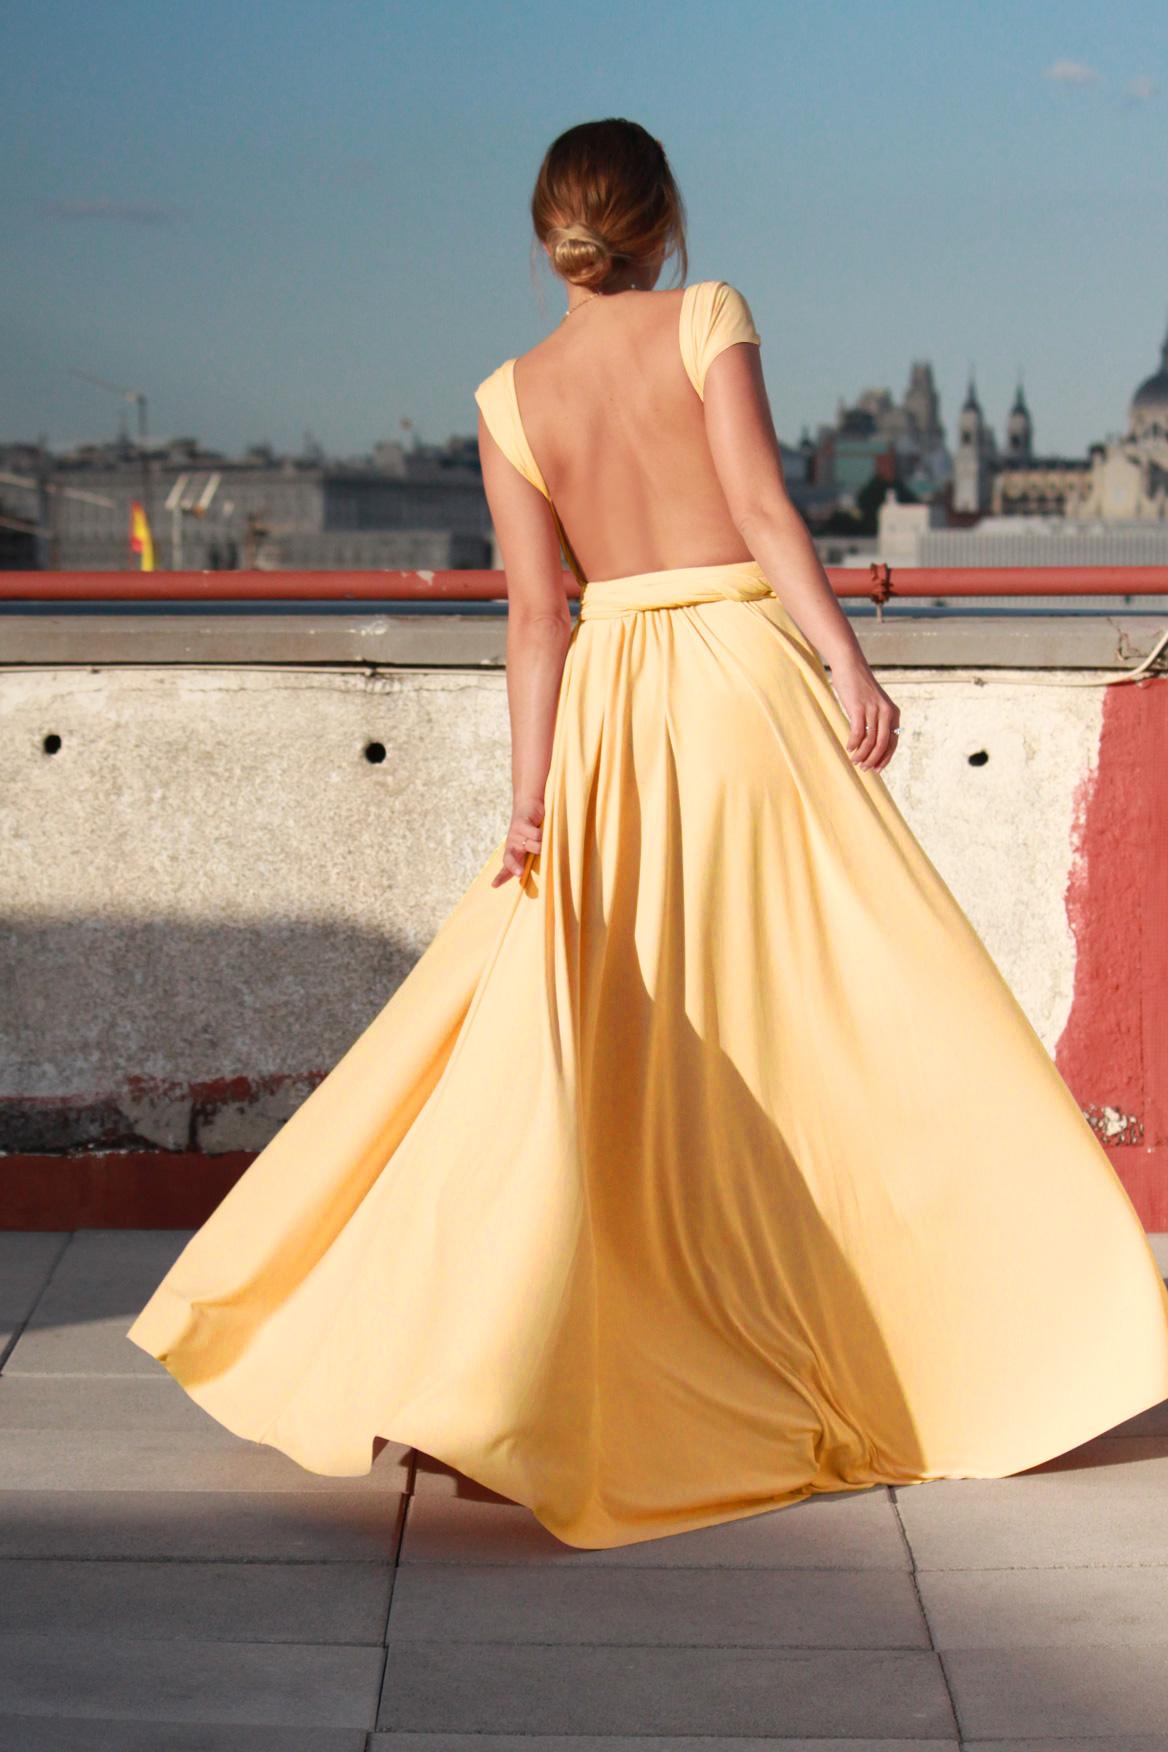 Lolita_McTisell_IMG_6529_amarillo.jpg